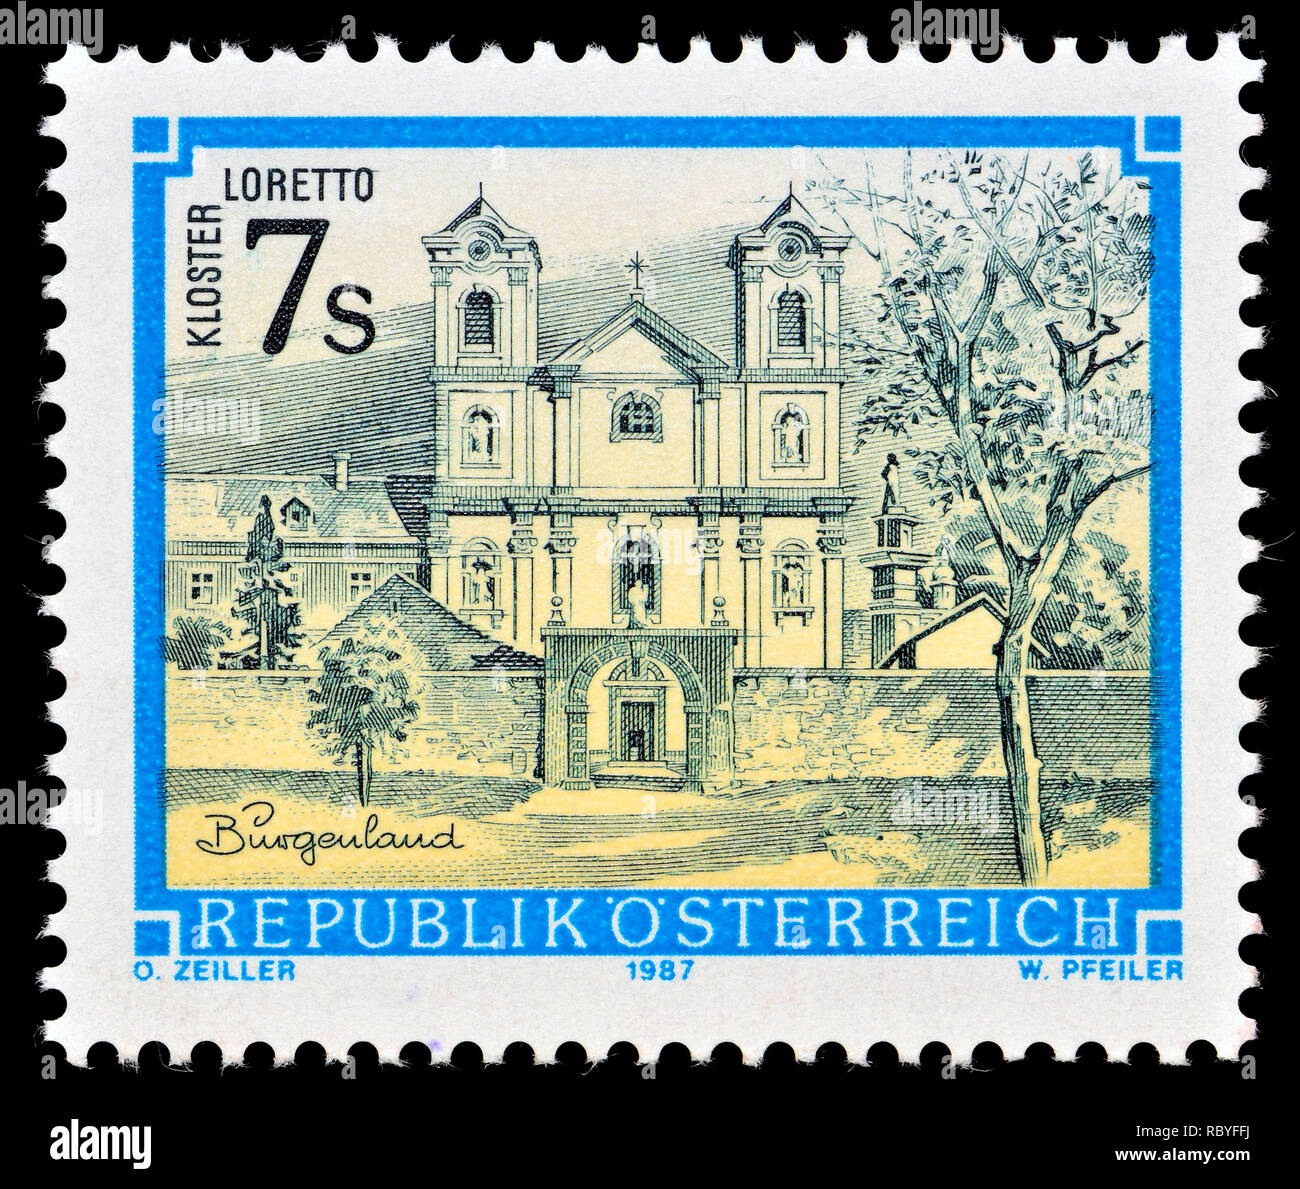 Austrian postage stamp (1987) : Monasteries and Abbeys series: Loretto Monastery / Kloster Loretto - Stock Image